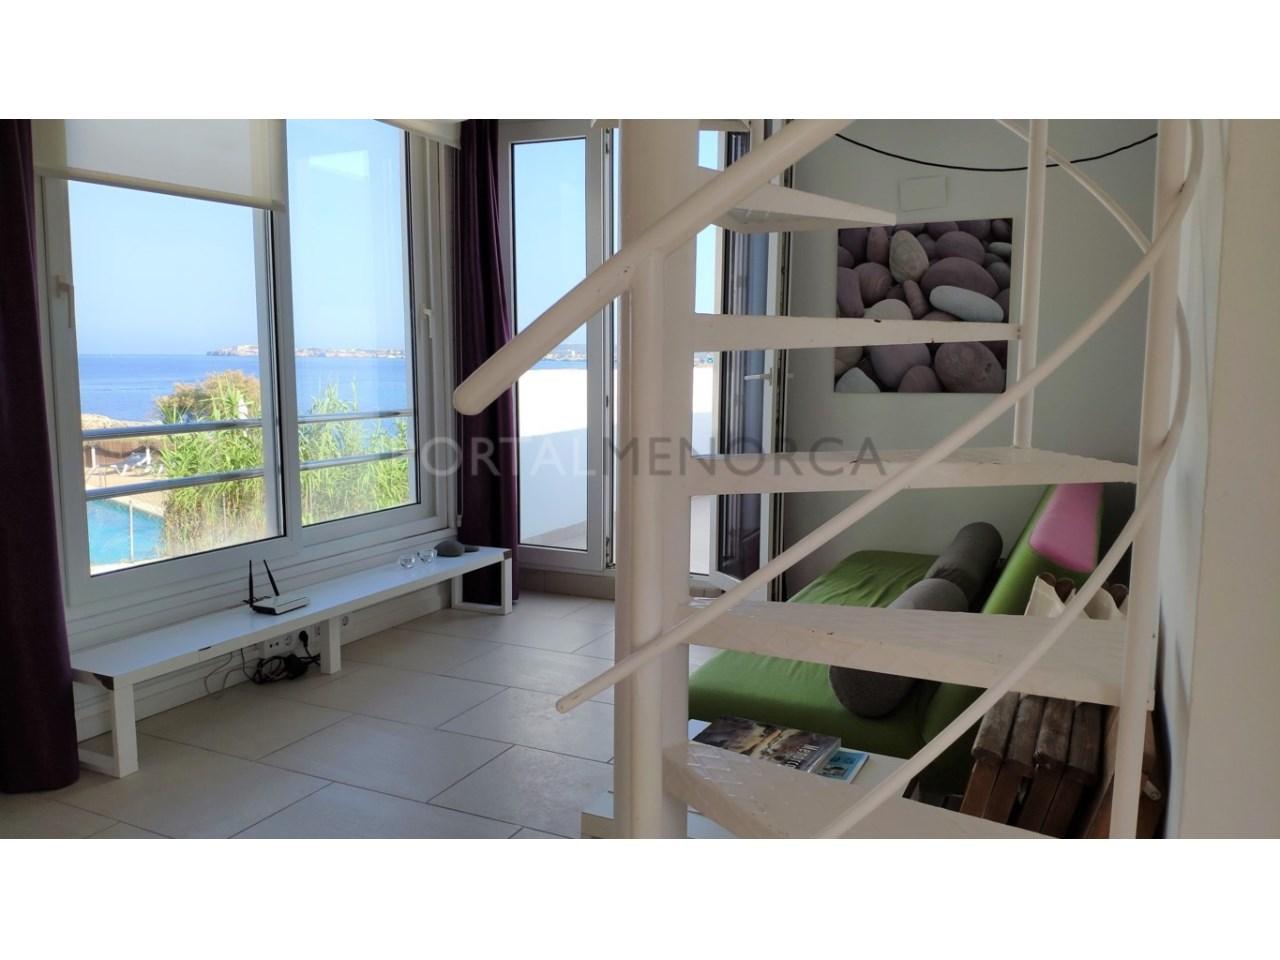 Modern apartment with sea views for sale in Cala Blanca Ciutadella Menorca- Living room